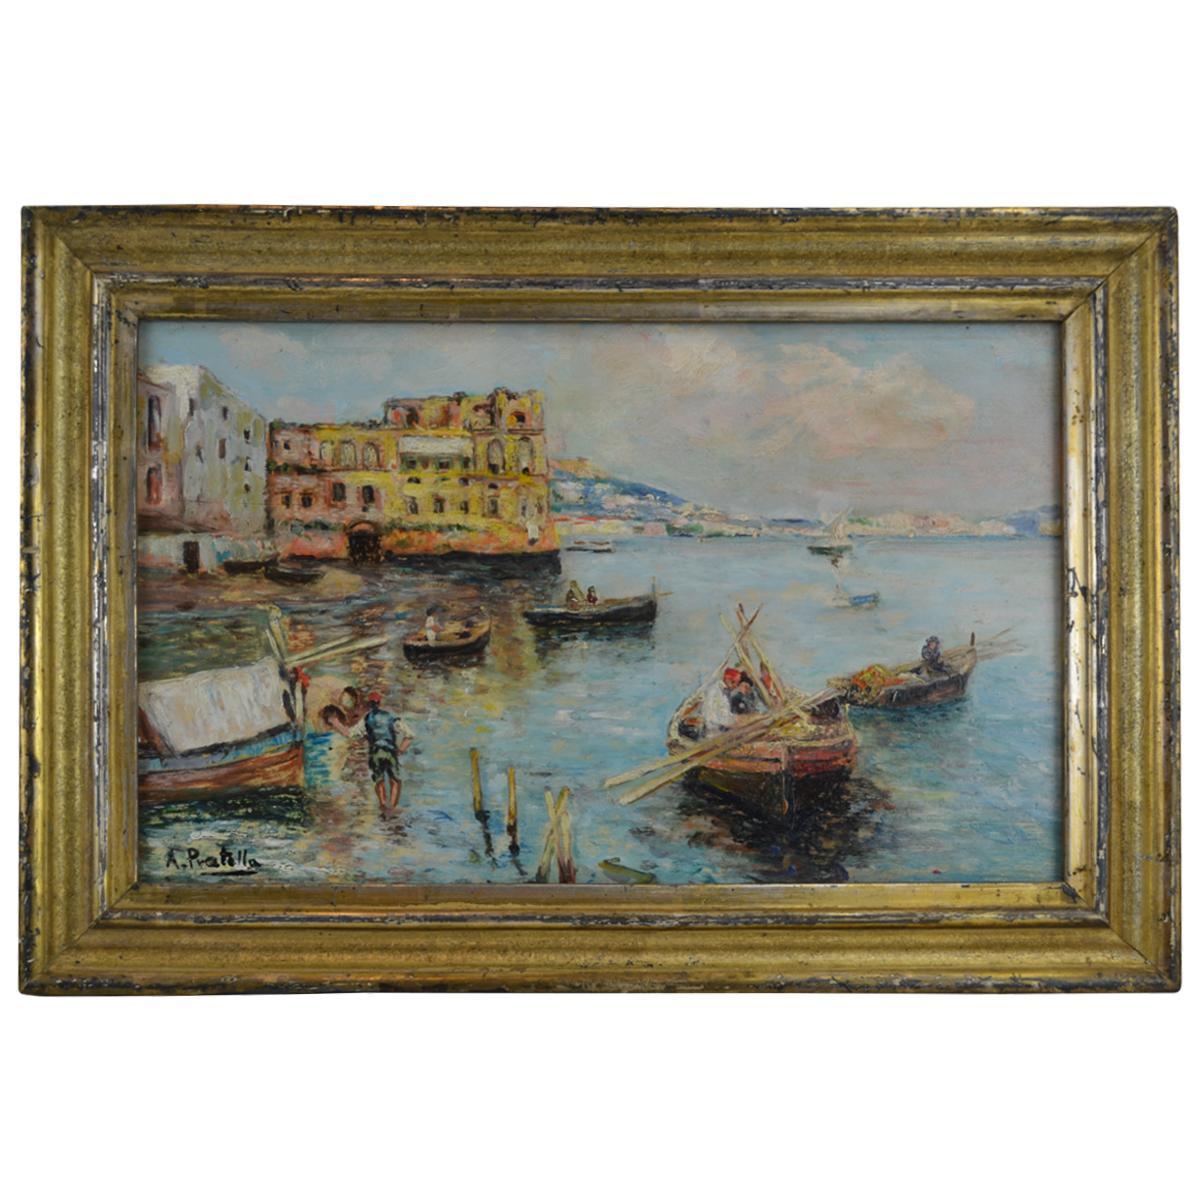 Fishing off the Coast of Naples by Landscape Artist Attilio Pratella